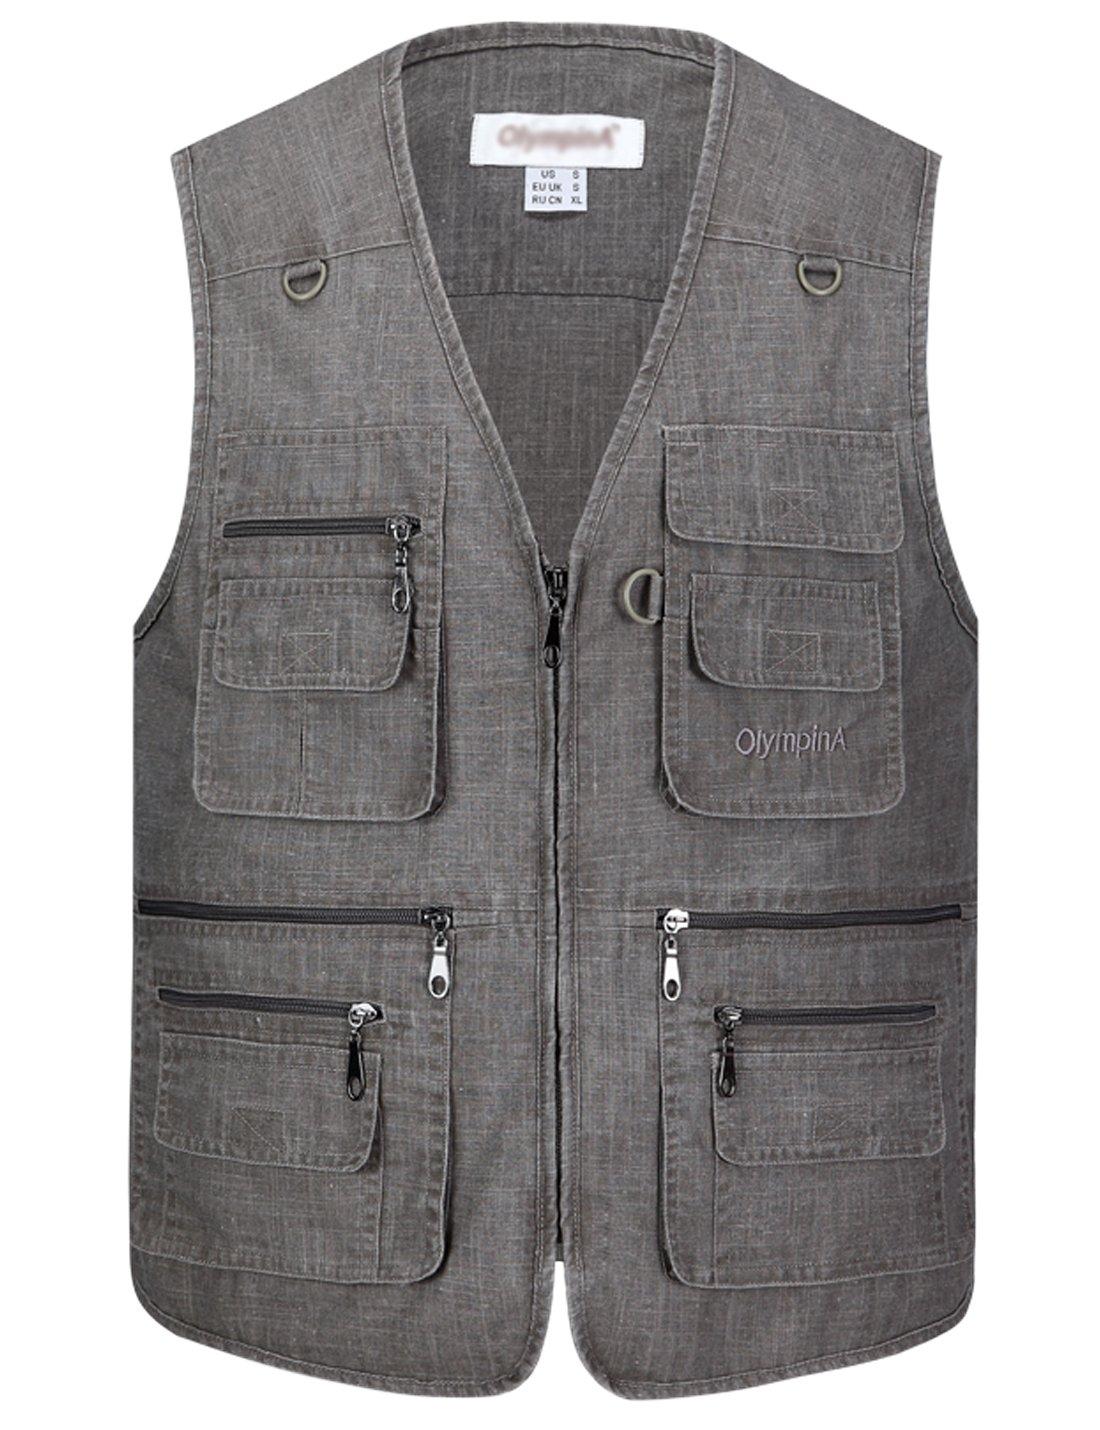 Gihuo Men's Summer Leisure Outdoor Pockets Fish Photo Journalist Vest Plus Size (Medium, Grey#2)